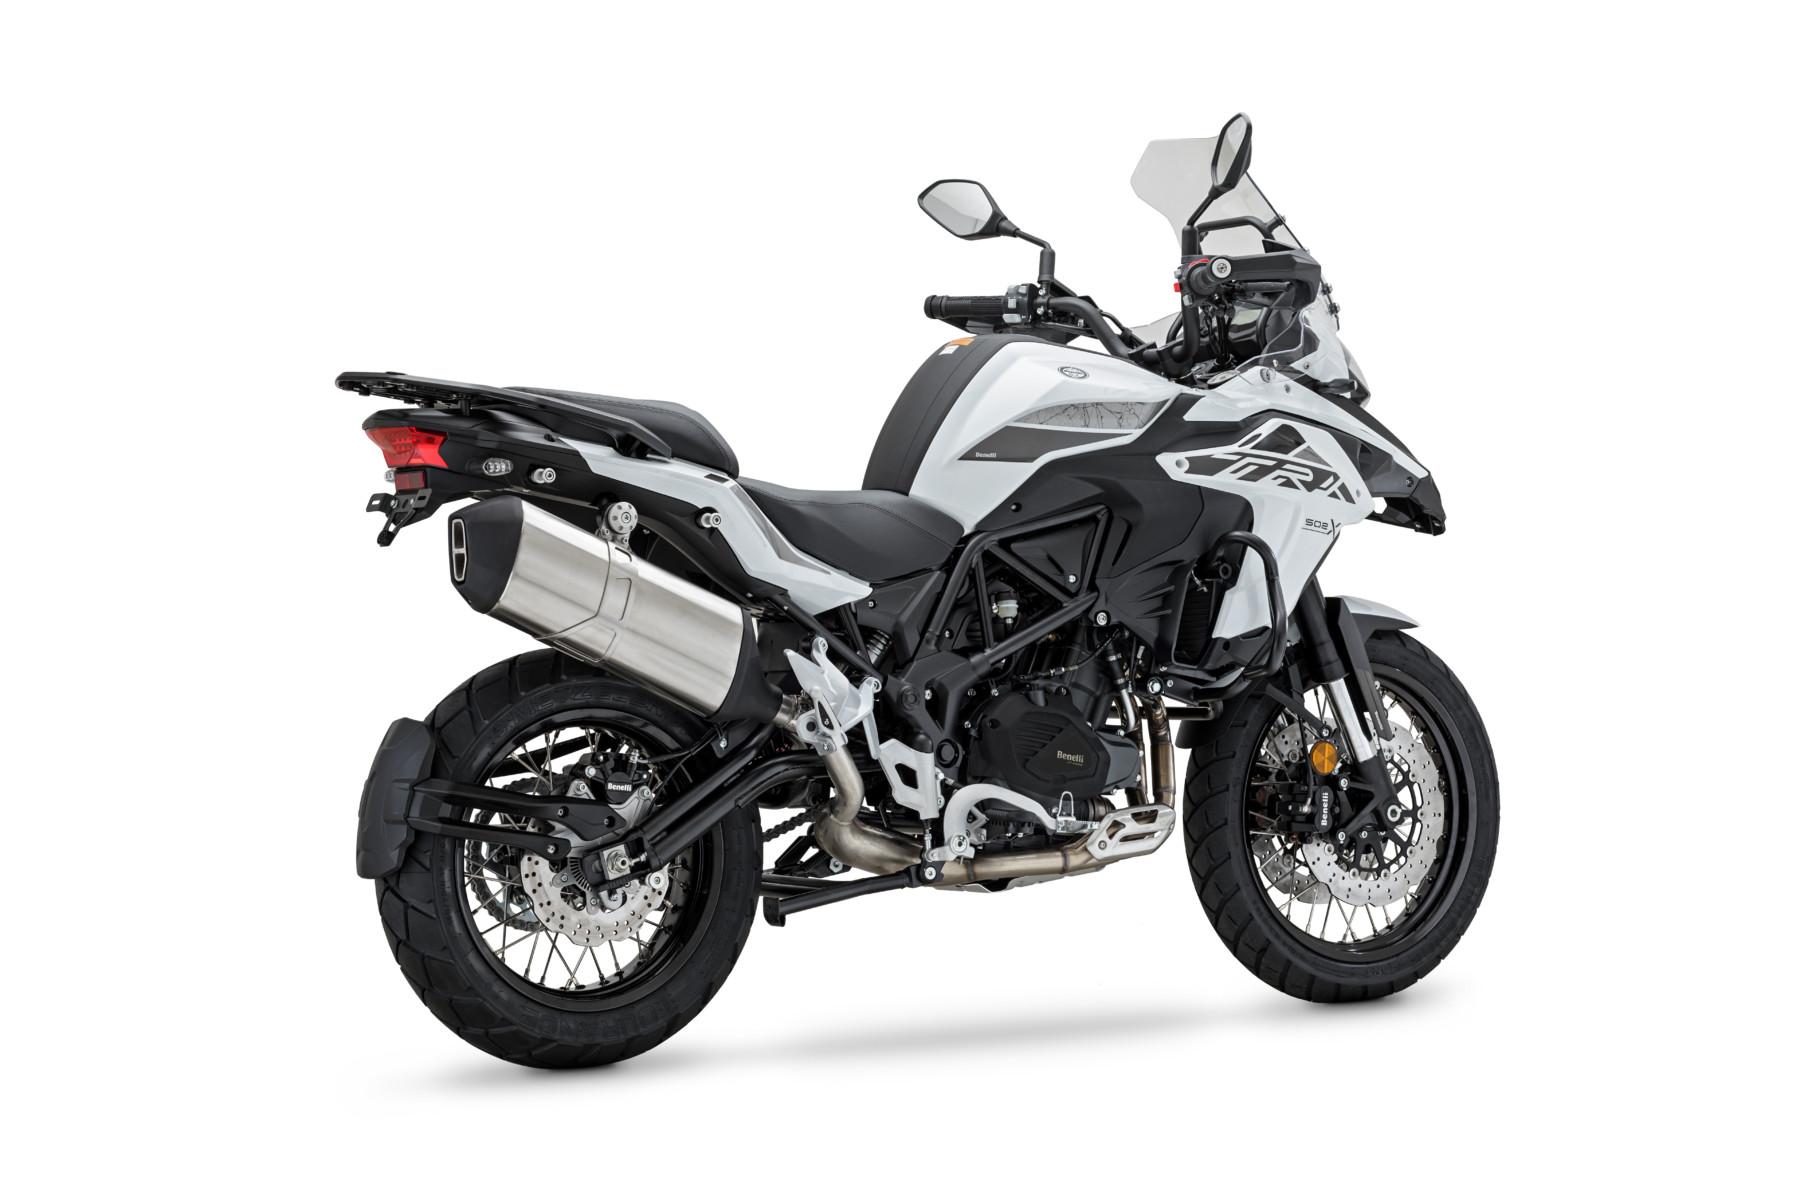 TRK502X (5)